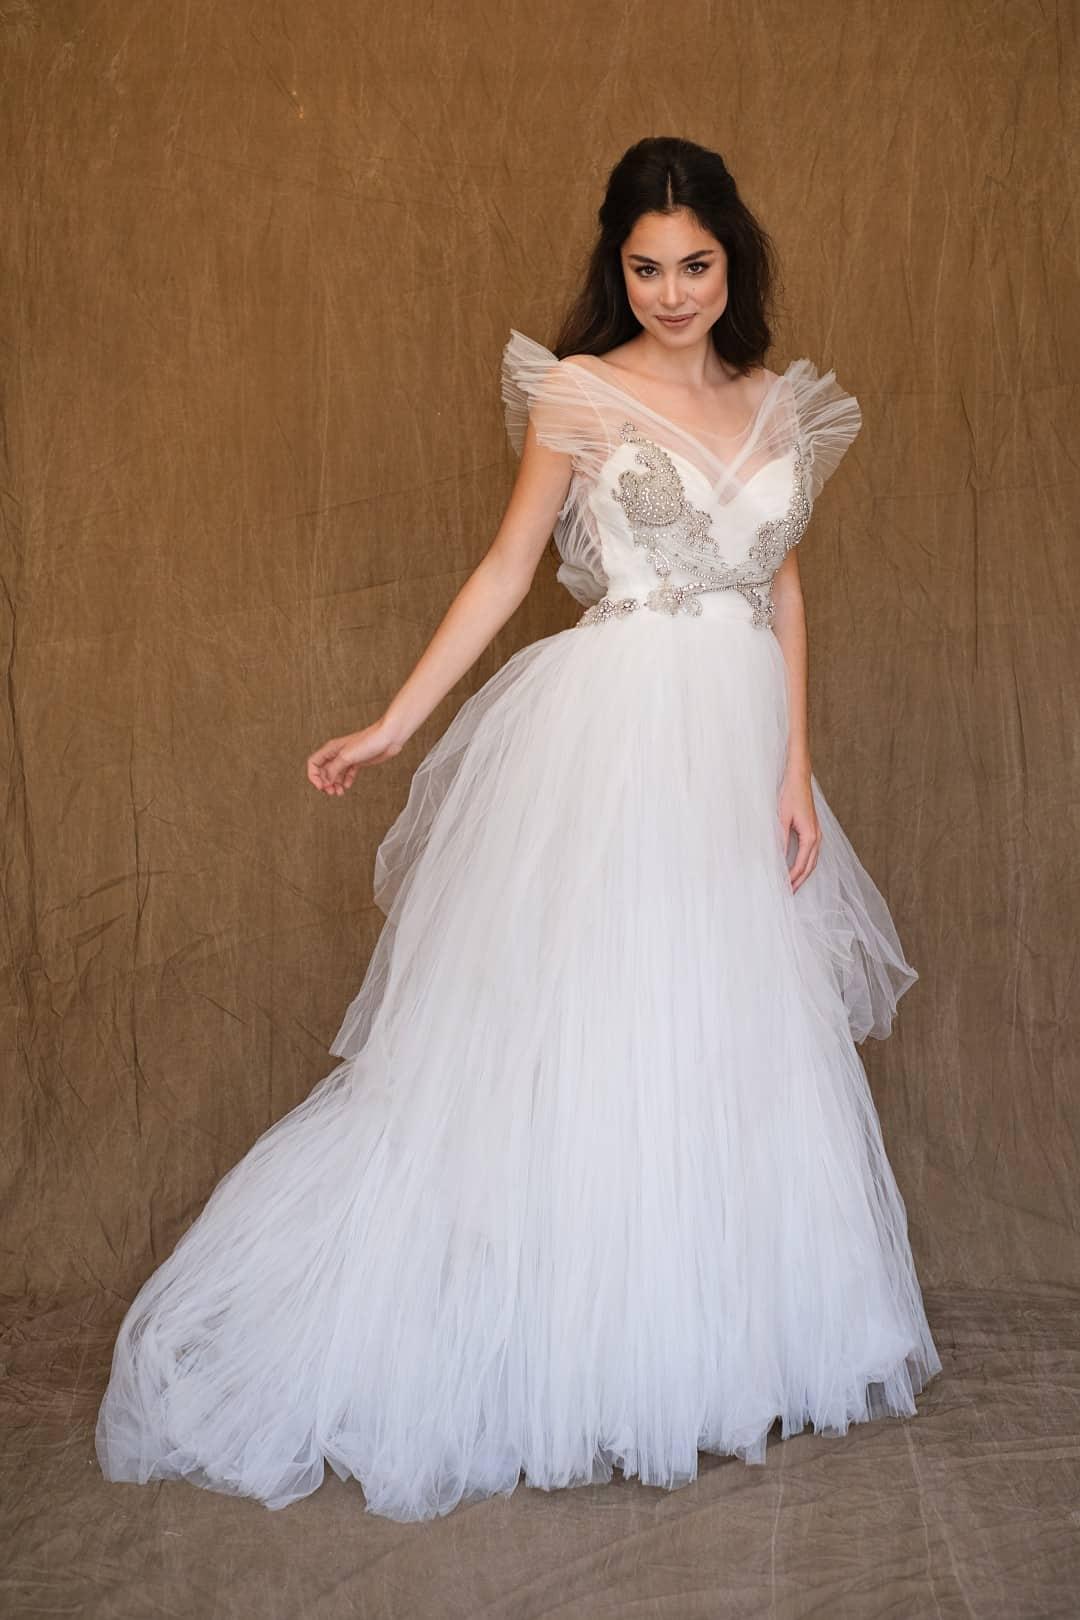 Jemné a romantické svadobné šaty - Marco&Maria - 14-1031-front